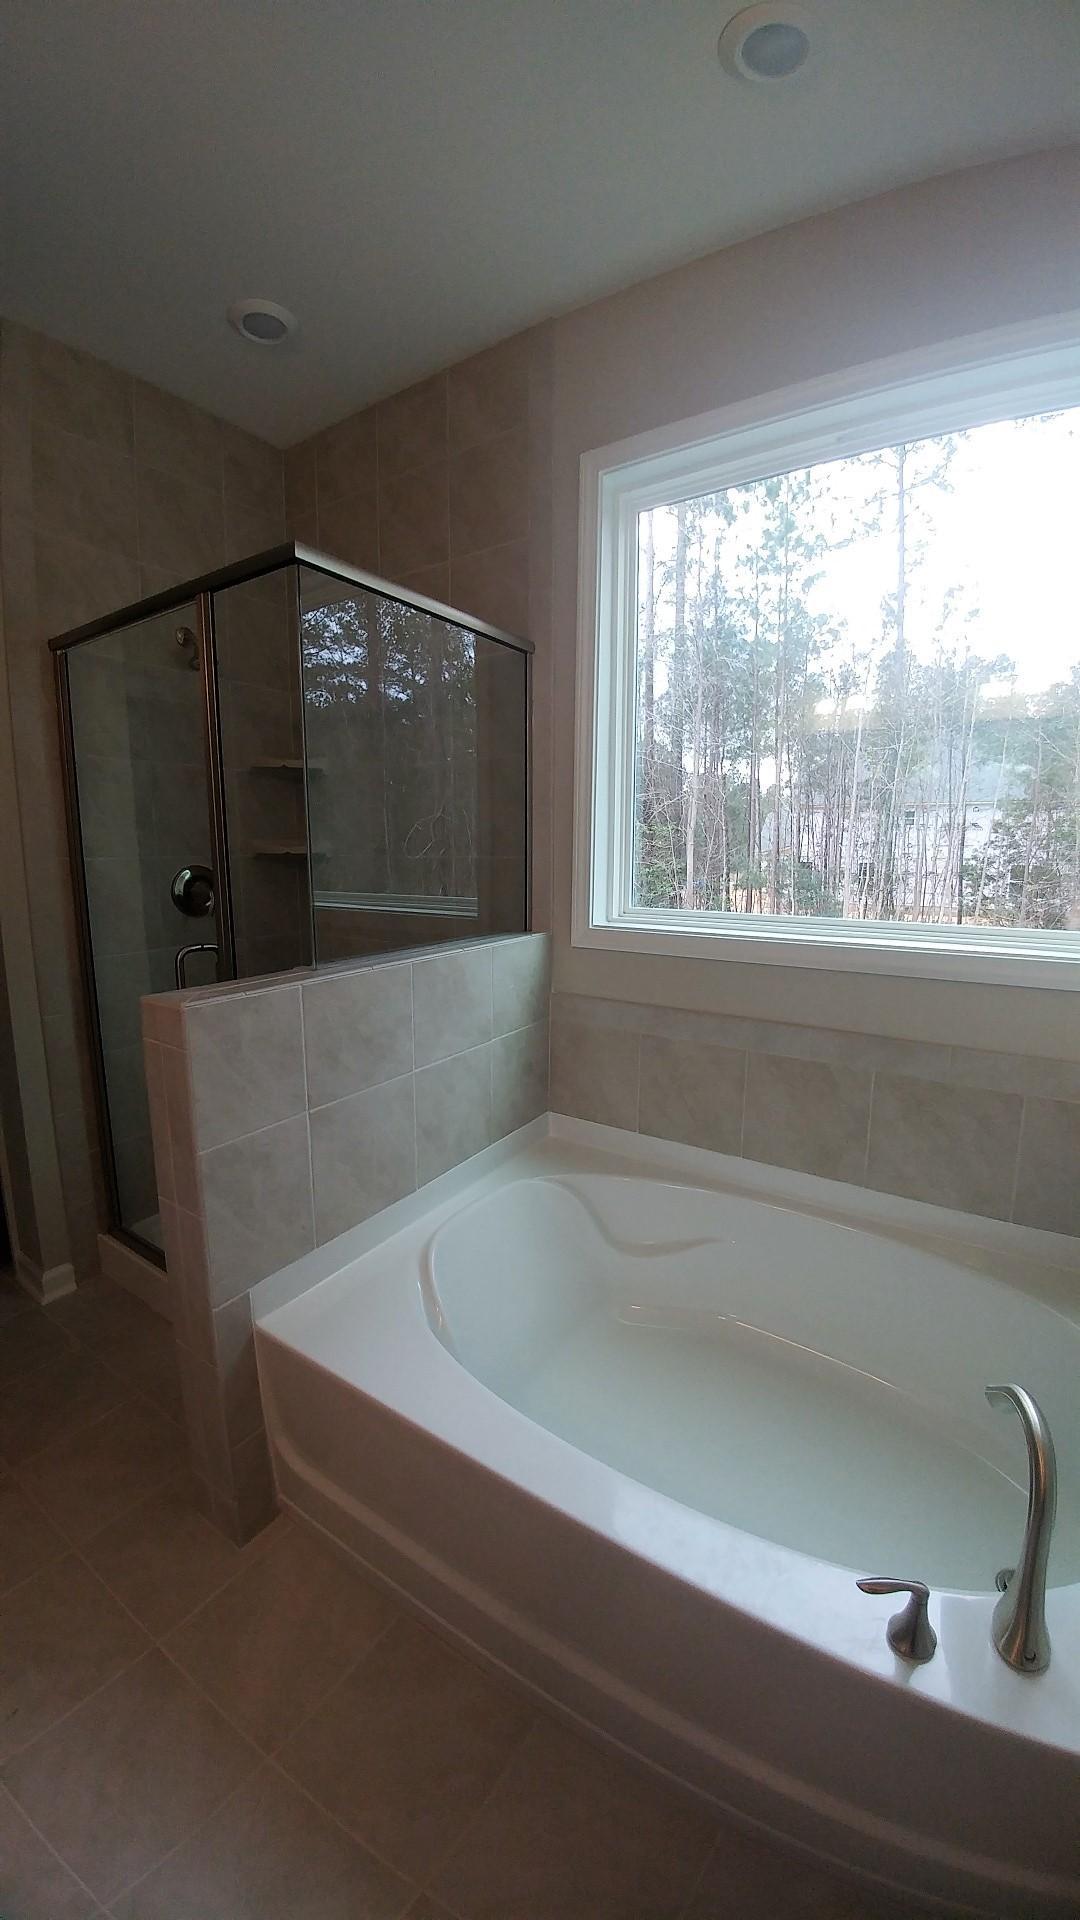 Carolina Bay Homes For Sale - 2008 Tacoma, Ridgeville, SC - 12